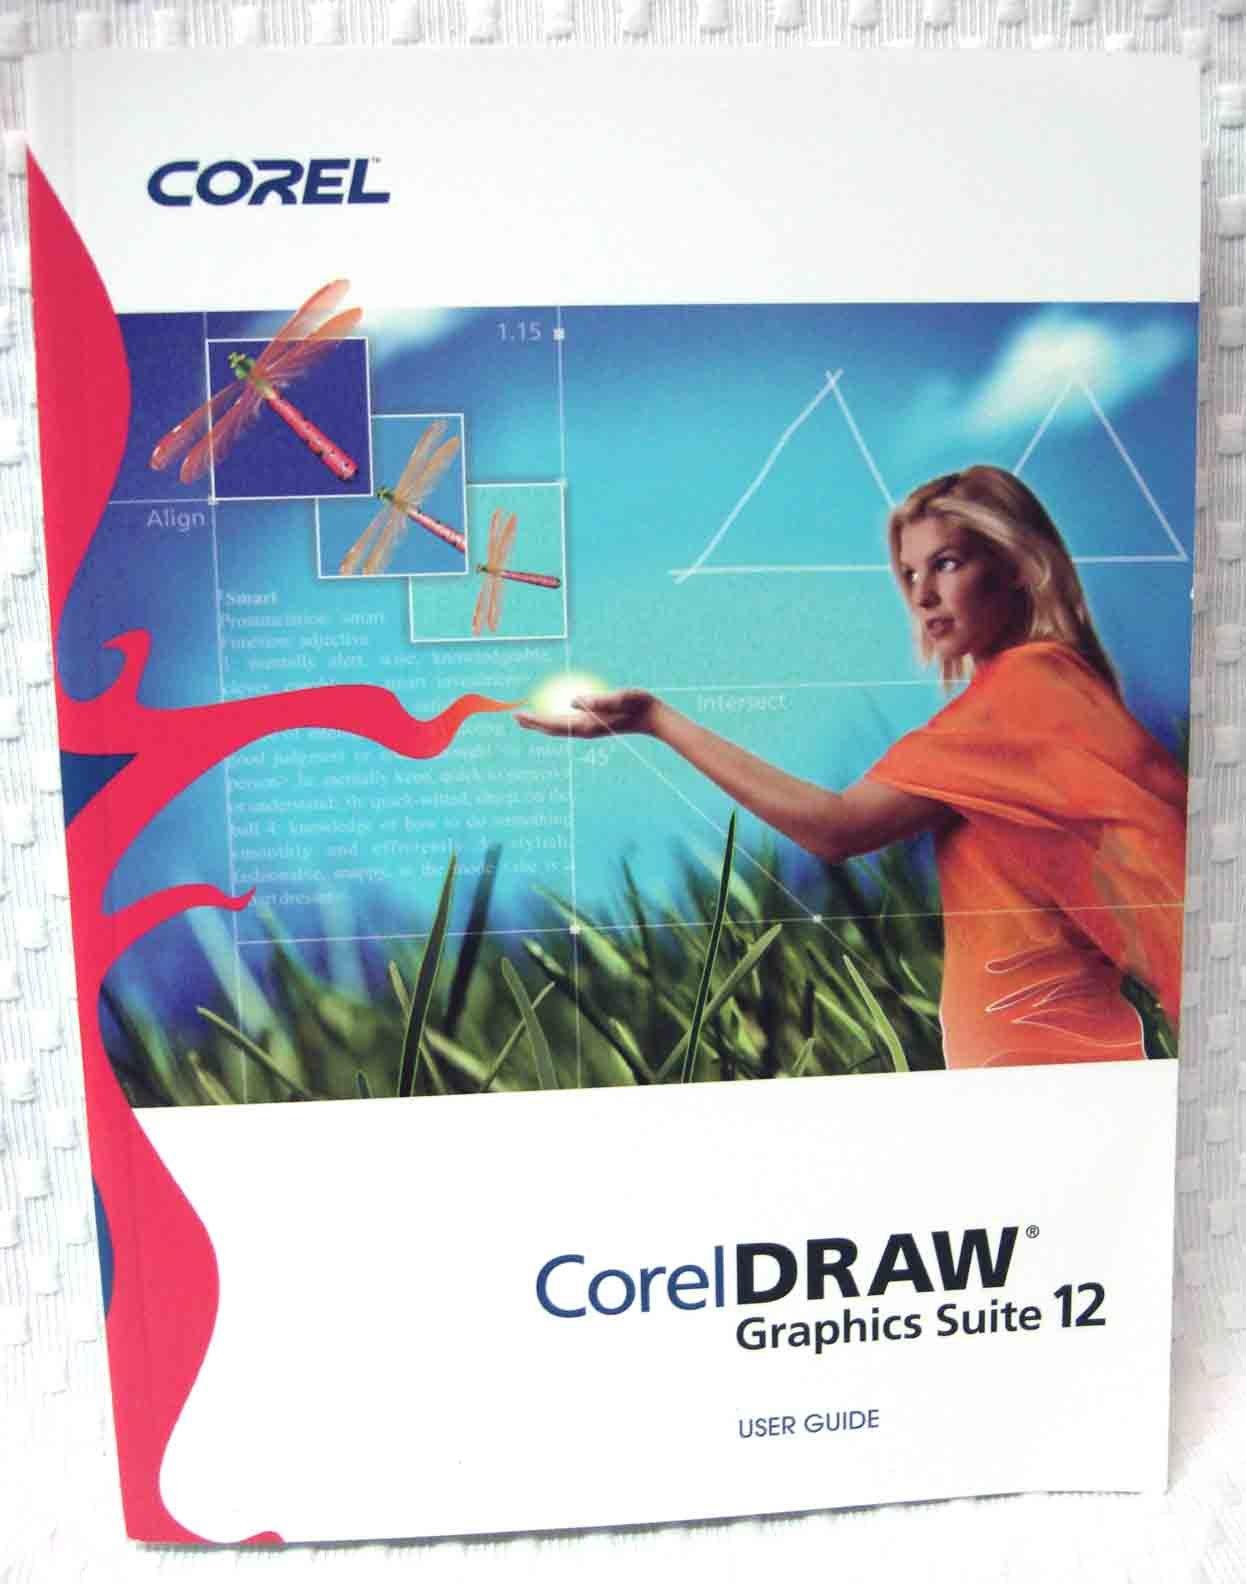 Poster design using coreldraw 12 - Amazon Com Coreldraw Graphics Suite 12 User Manual English 0735163100426 Books